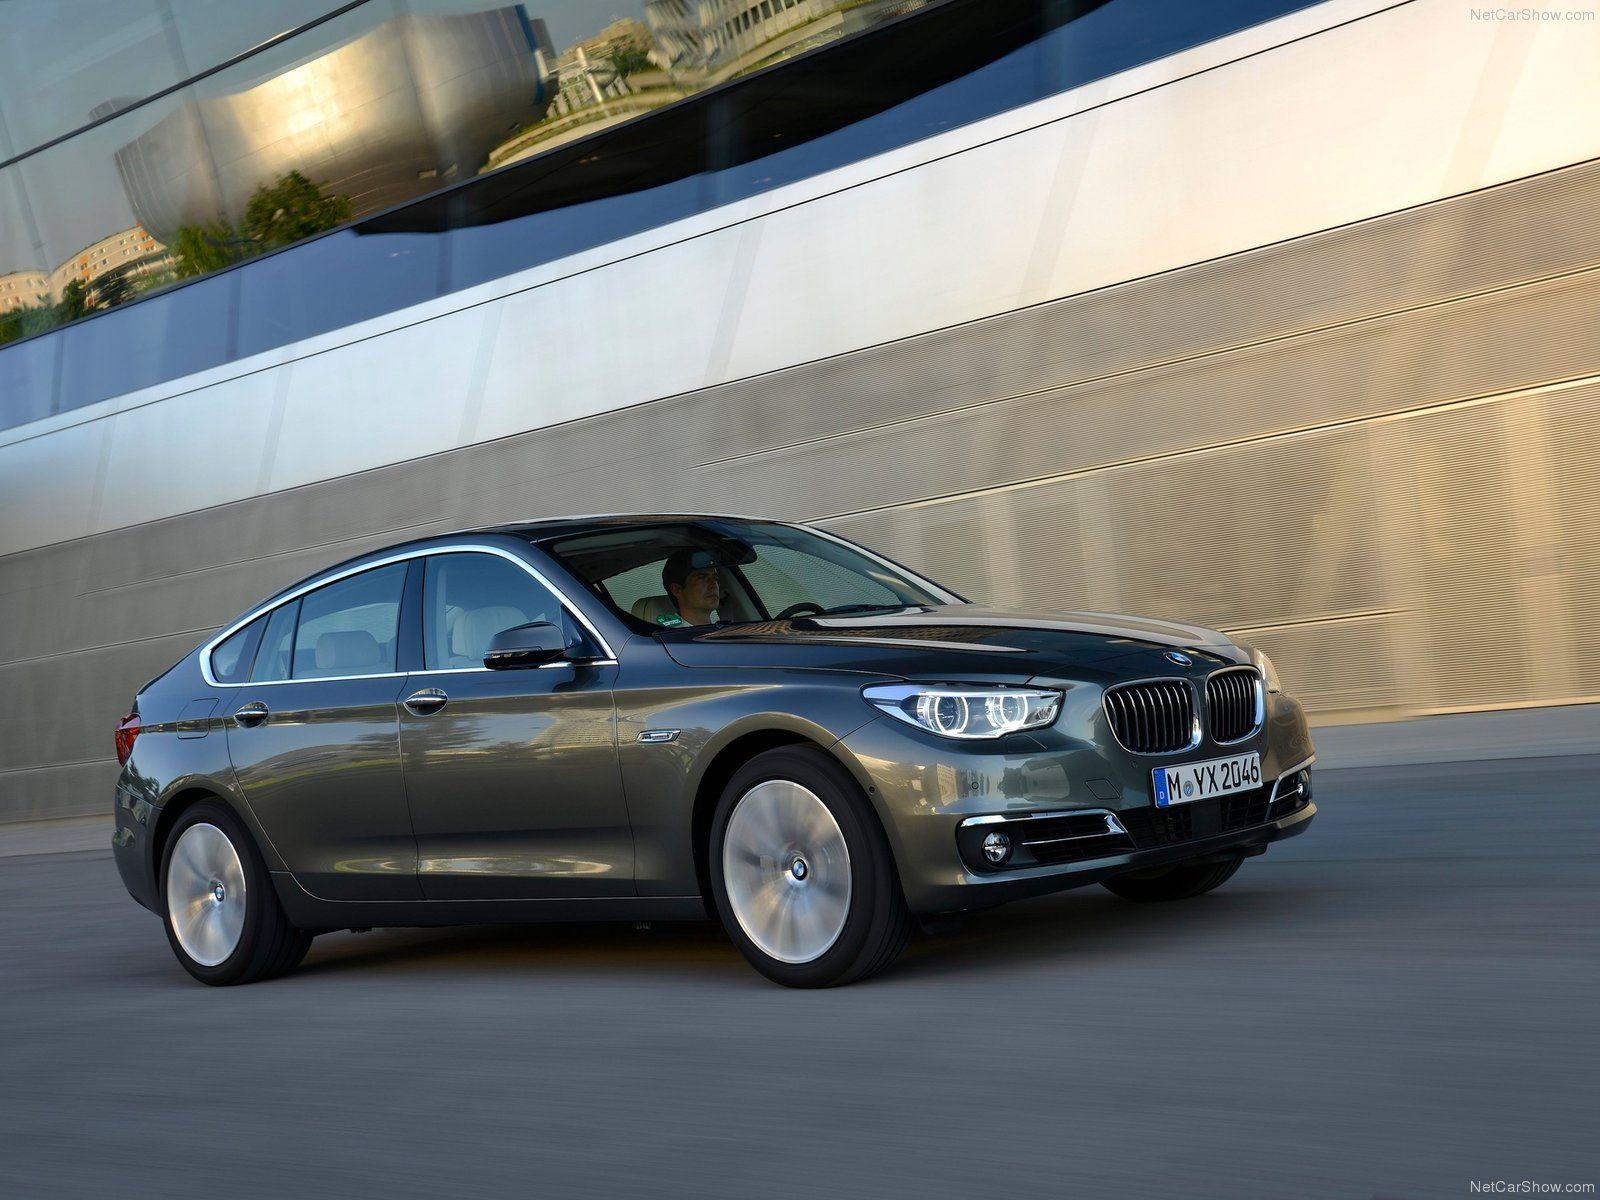 2014 BMW 5Series Gran Turismo Bmw love, Bmw, Cars